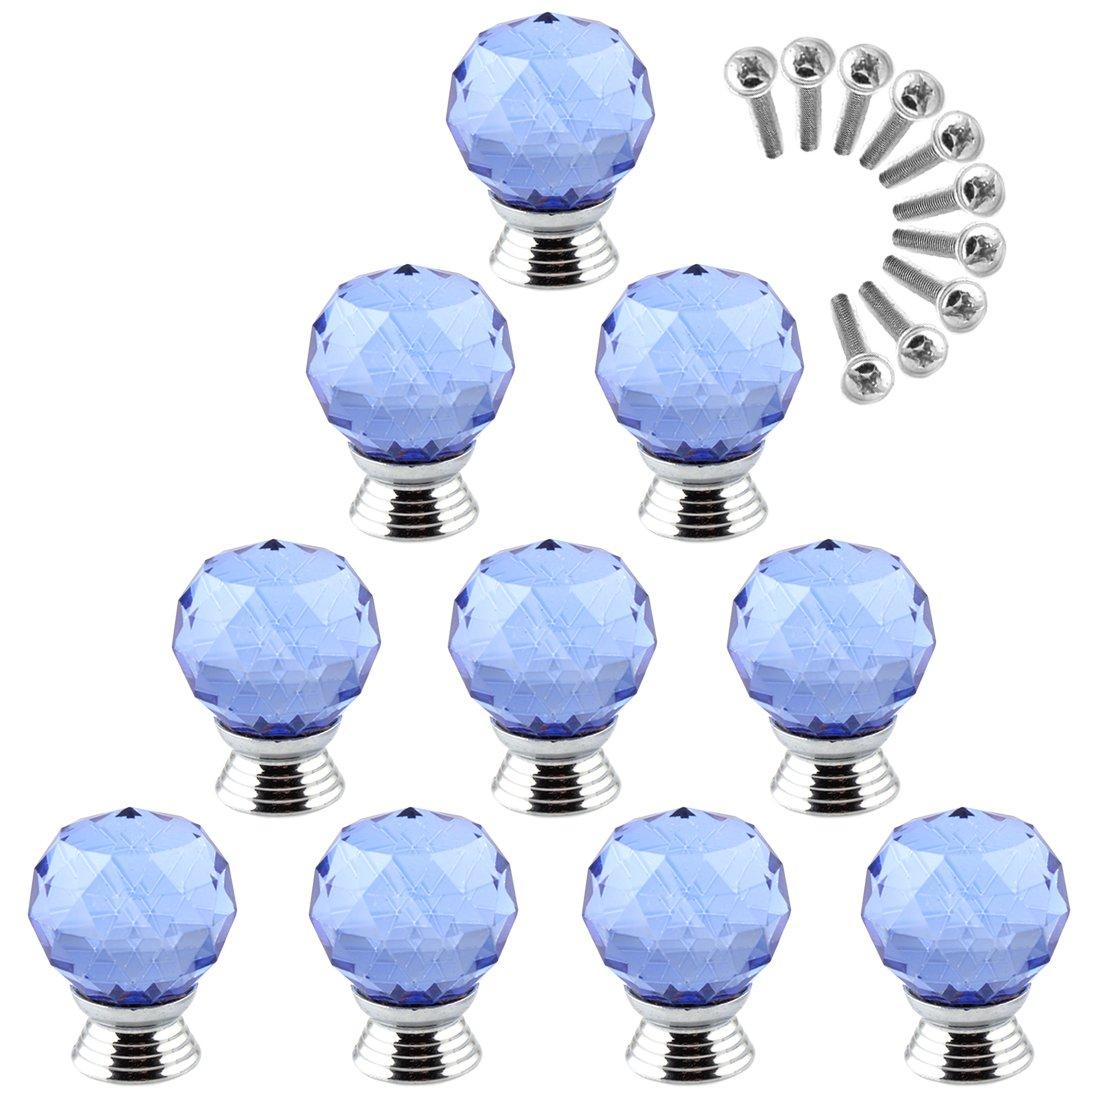 Goshfun 10Pcs Crystal Kitchen Cabinet Knobs Glass Furniture Cupboard Round Drawer Pull Handle - Blue